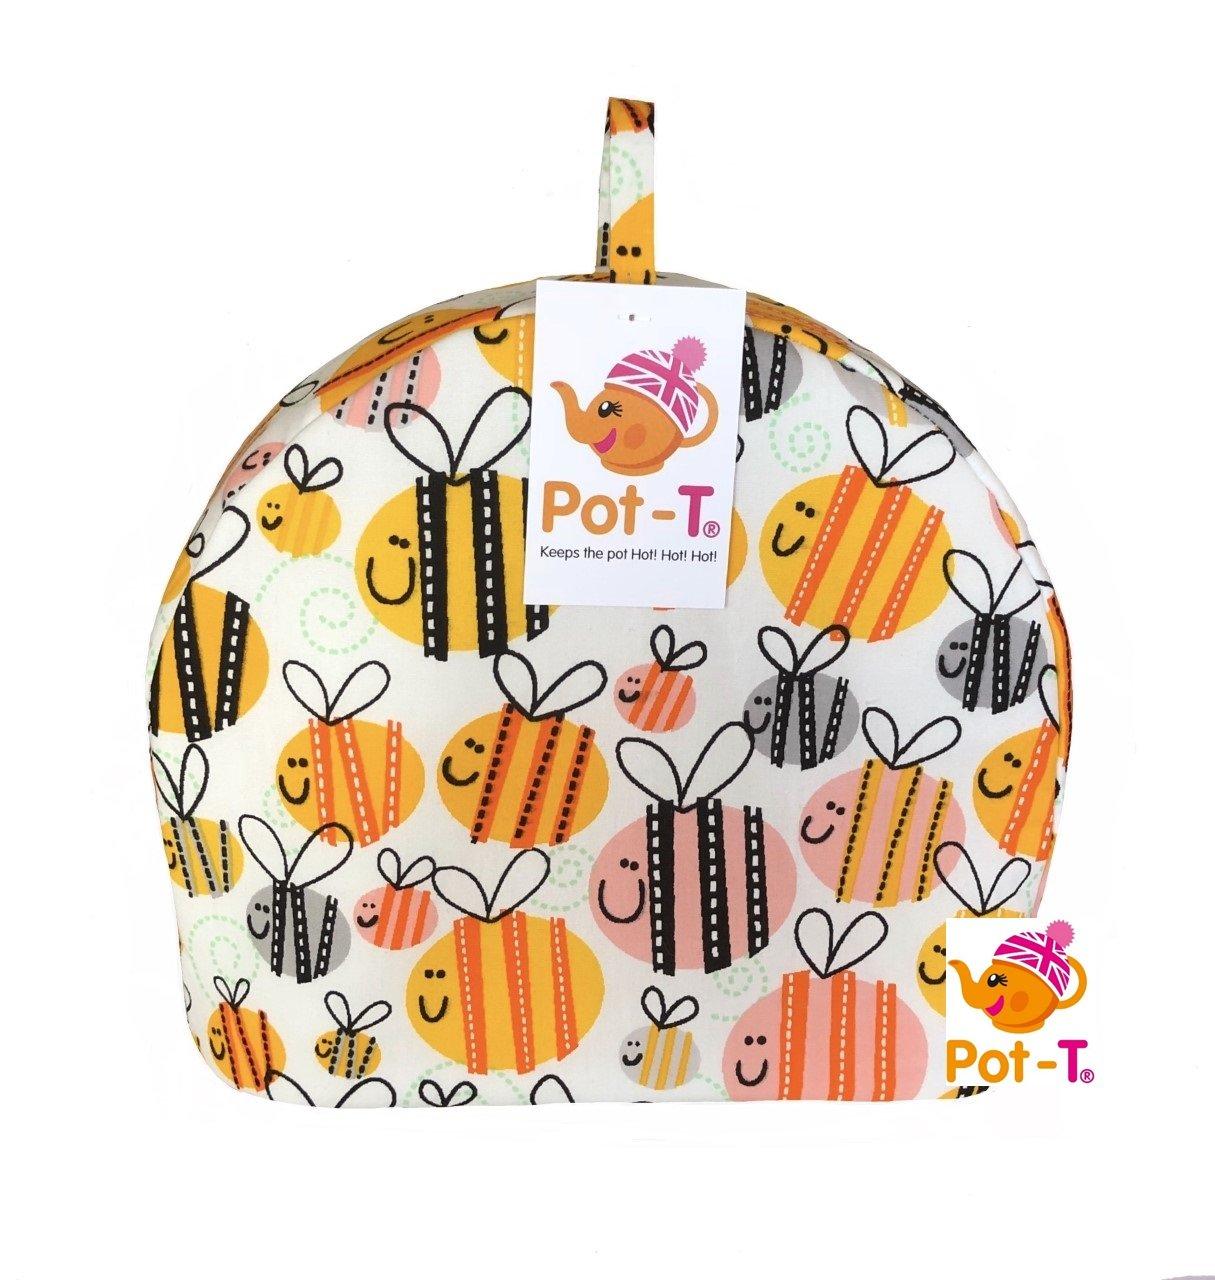 Pot-T INSULATED Tea Cosy Cozy in Buzzy Bees (Mini (16.5cm(h) x 8.5cm(d) x 20cm(l))) Coolcozycovers LTD